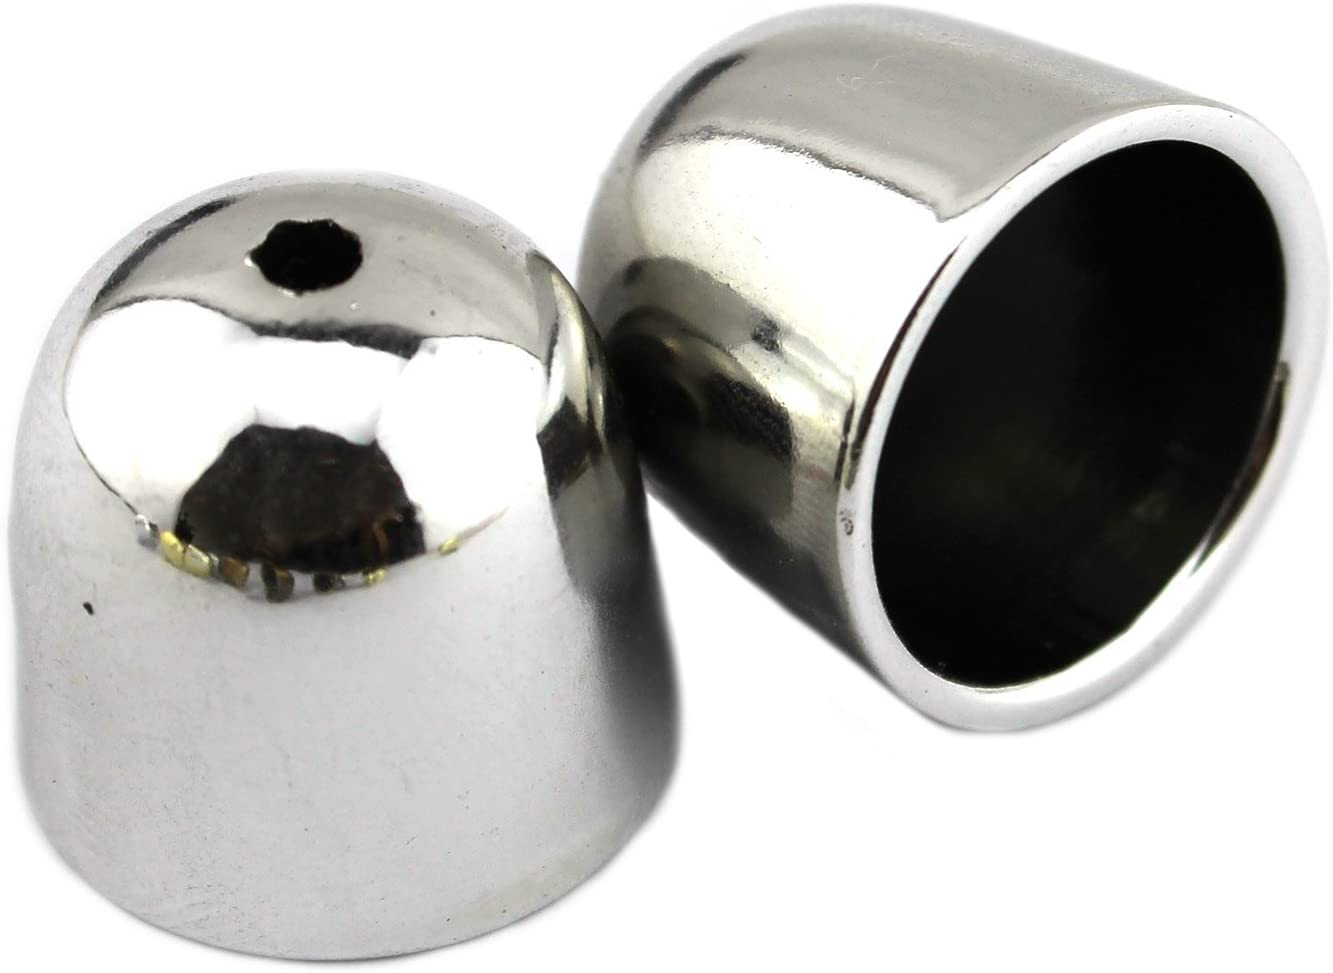 PendantScarf Popular brand Ranking TOP18 Jewelry Caps Silver Tone Bead Plastic End Cap Jewel